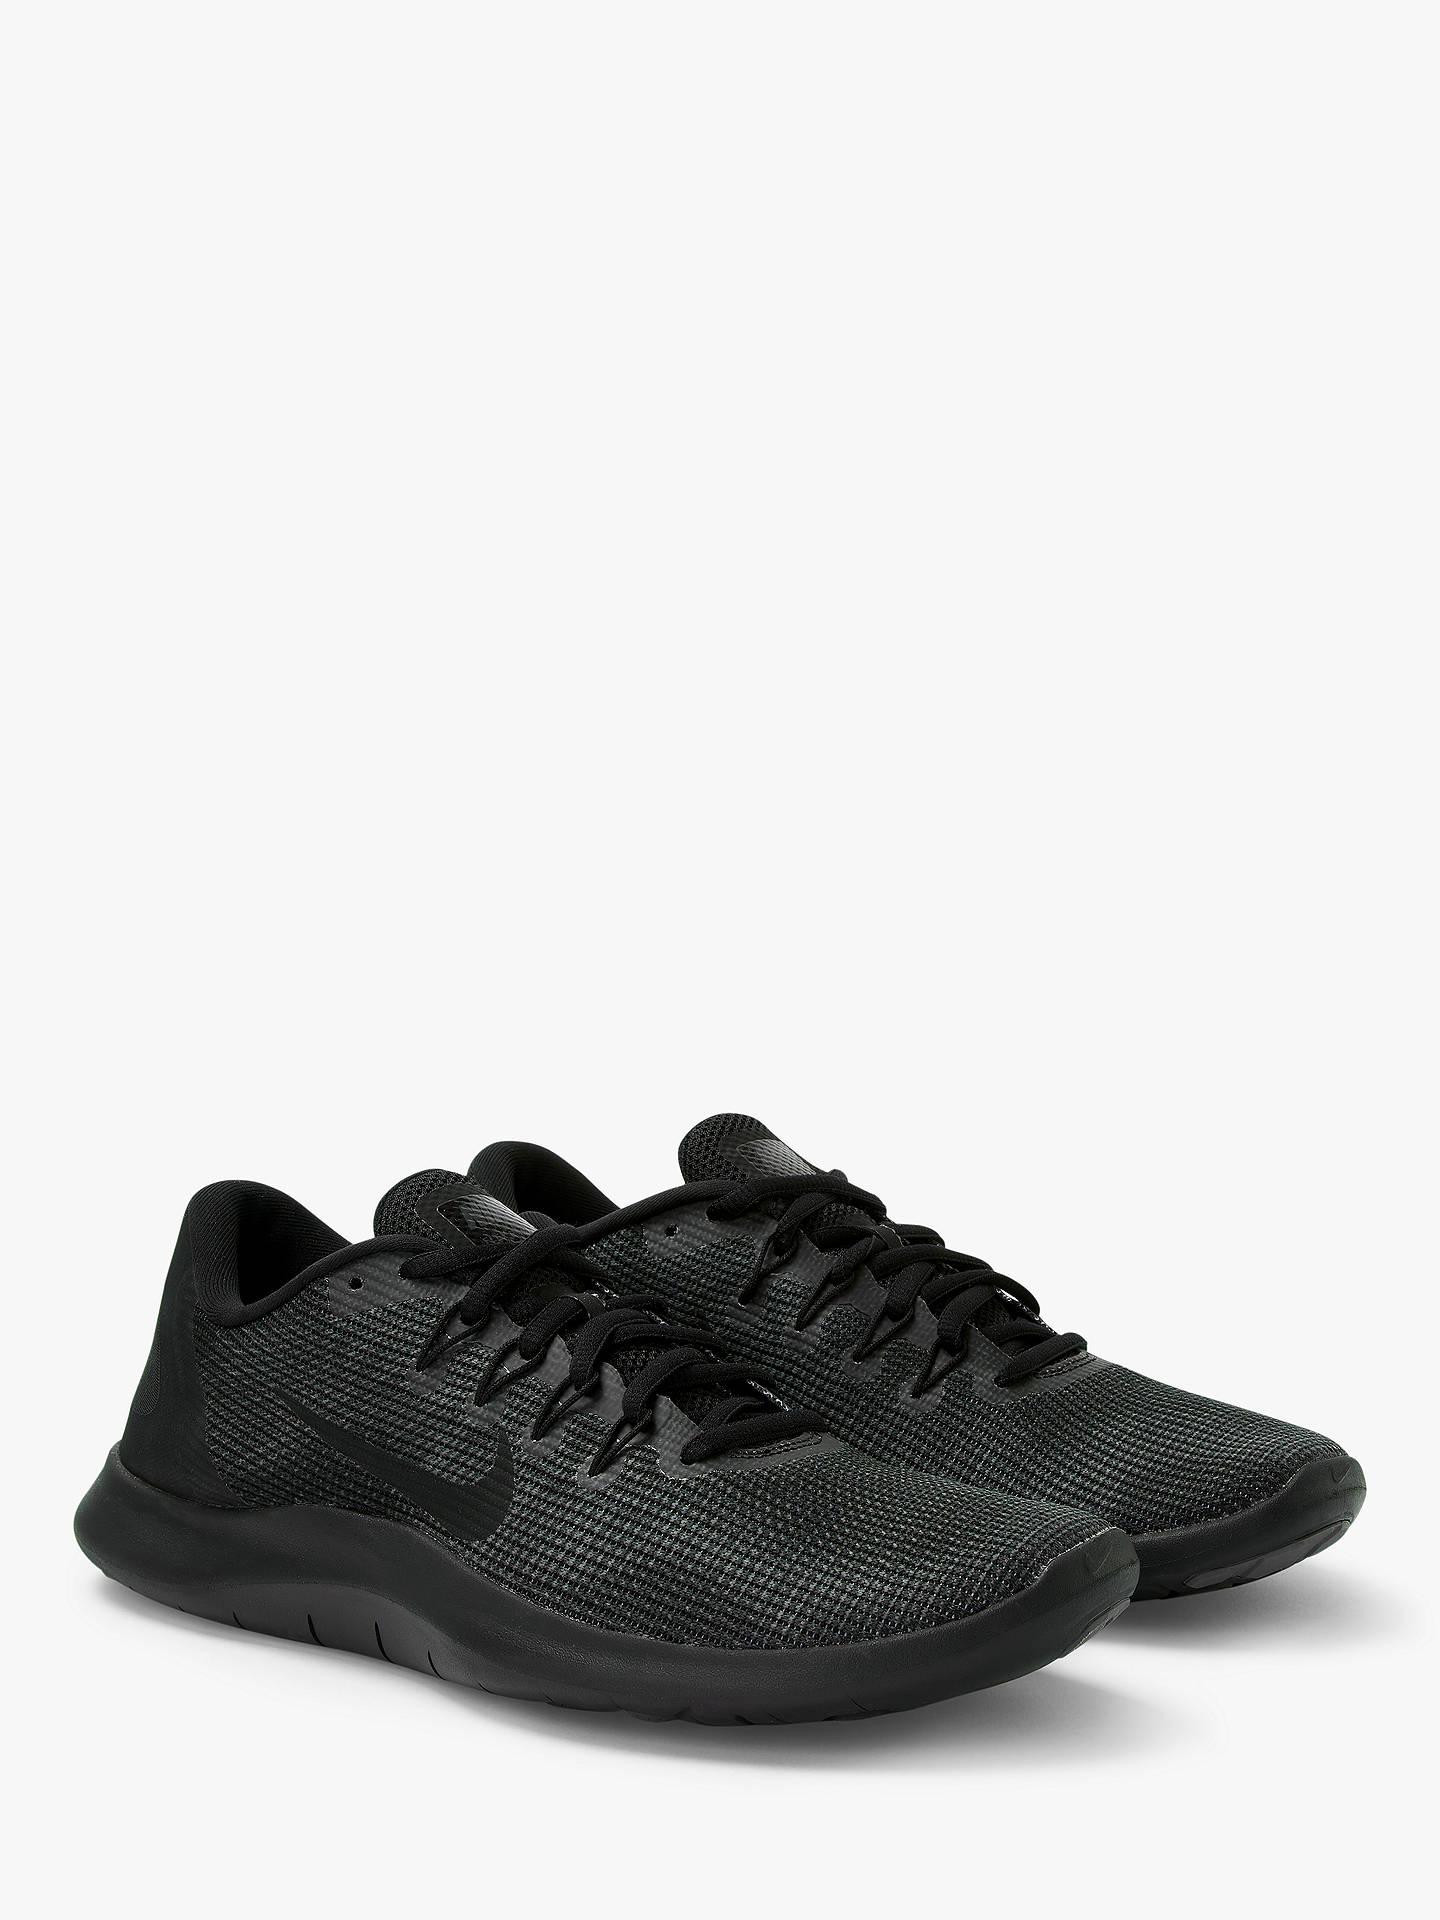 best loved 6bd16 2c72d Nike Flex RN 2018 Men's Running Shoes, Black/Grey at John ...